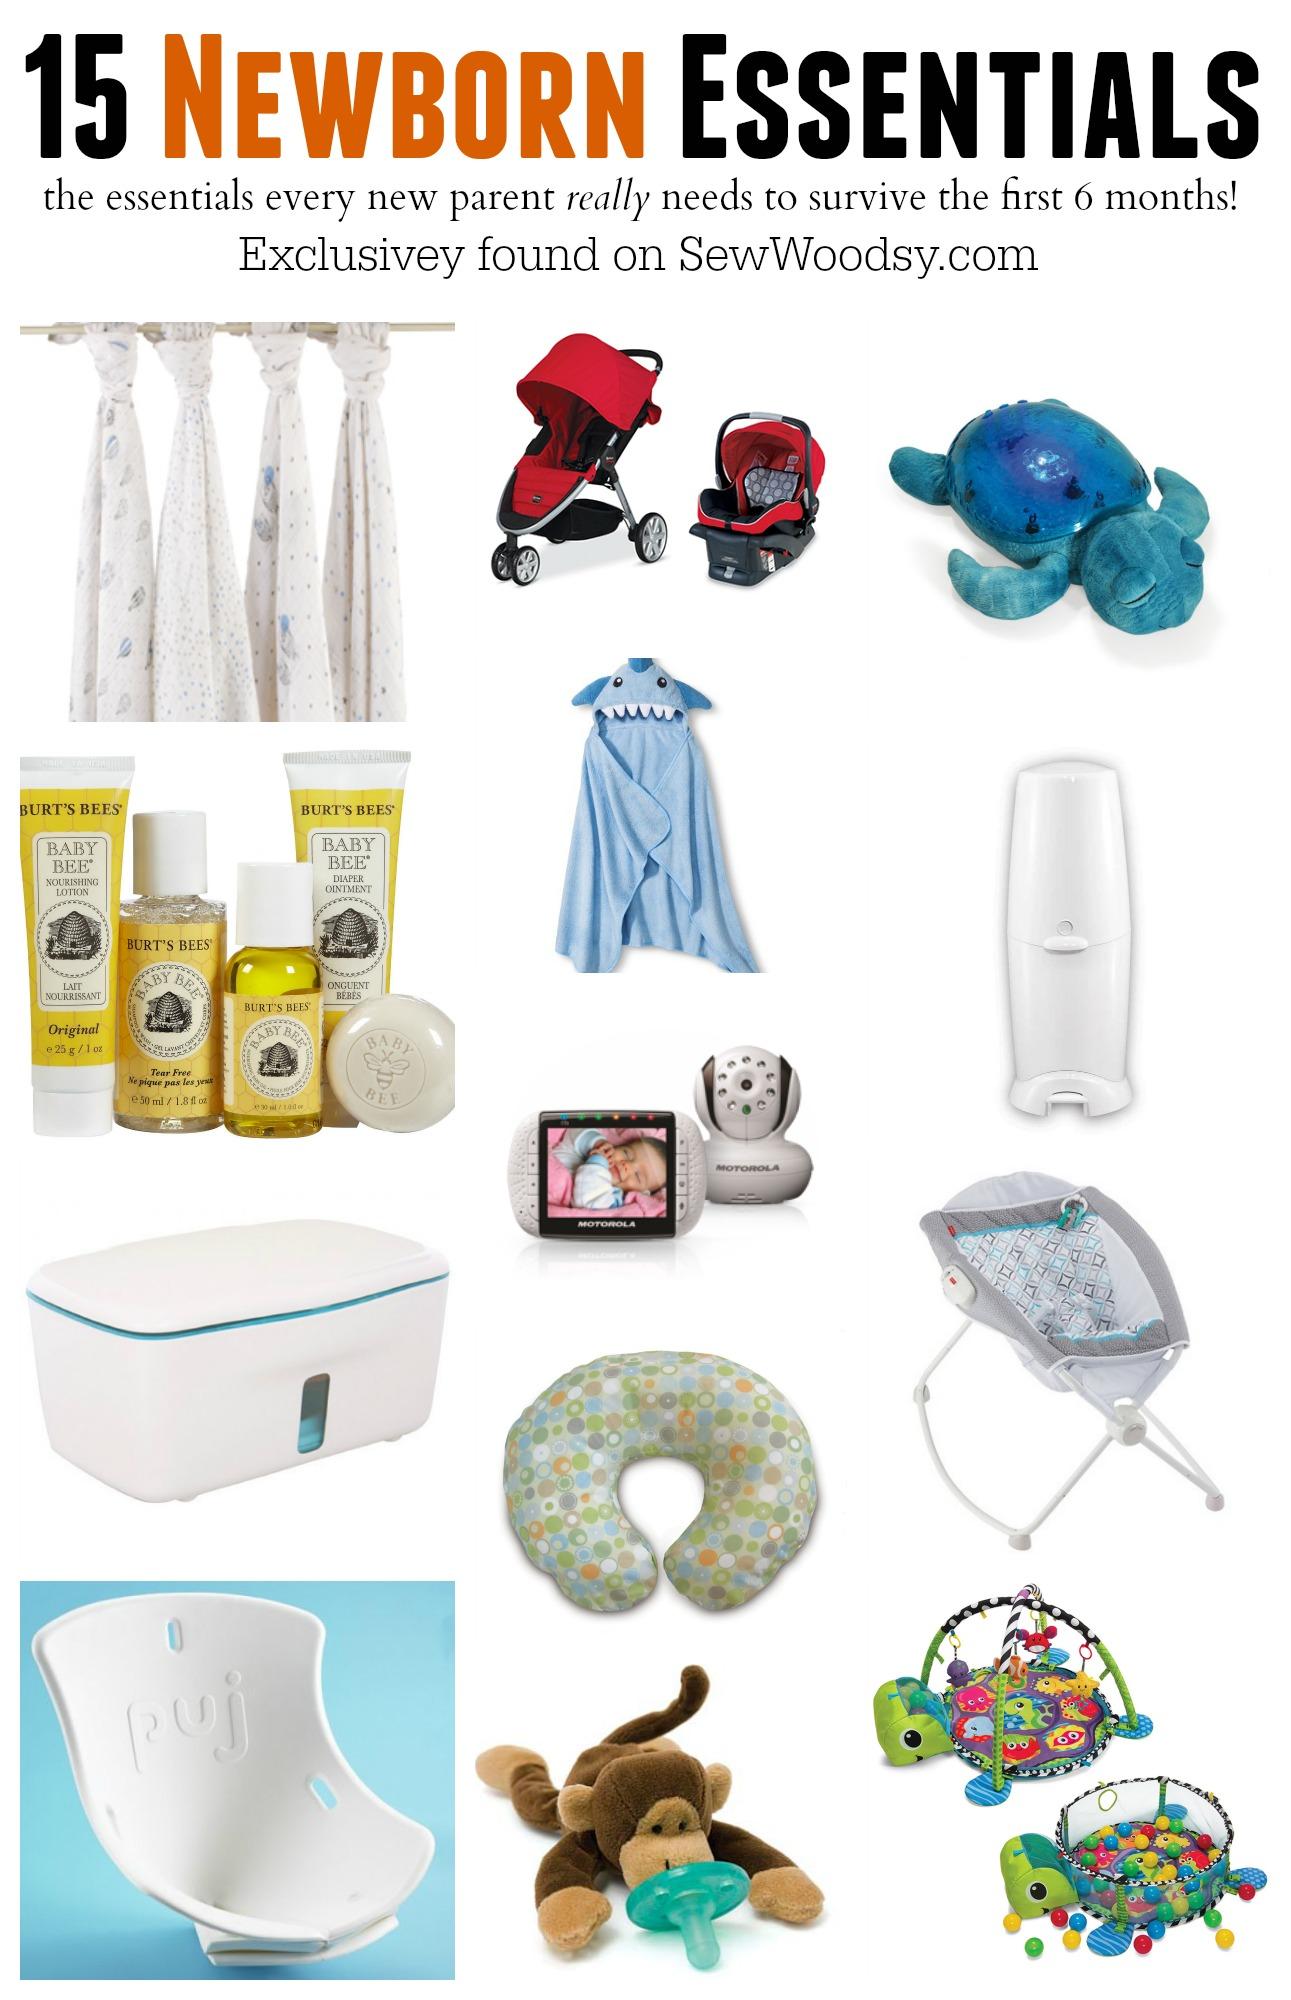 15 Newborn Essentials Sew Woodsy